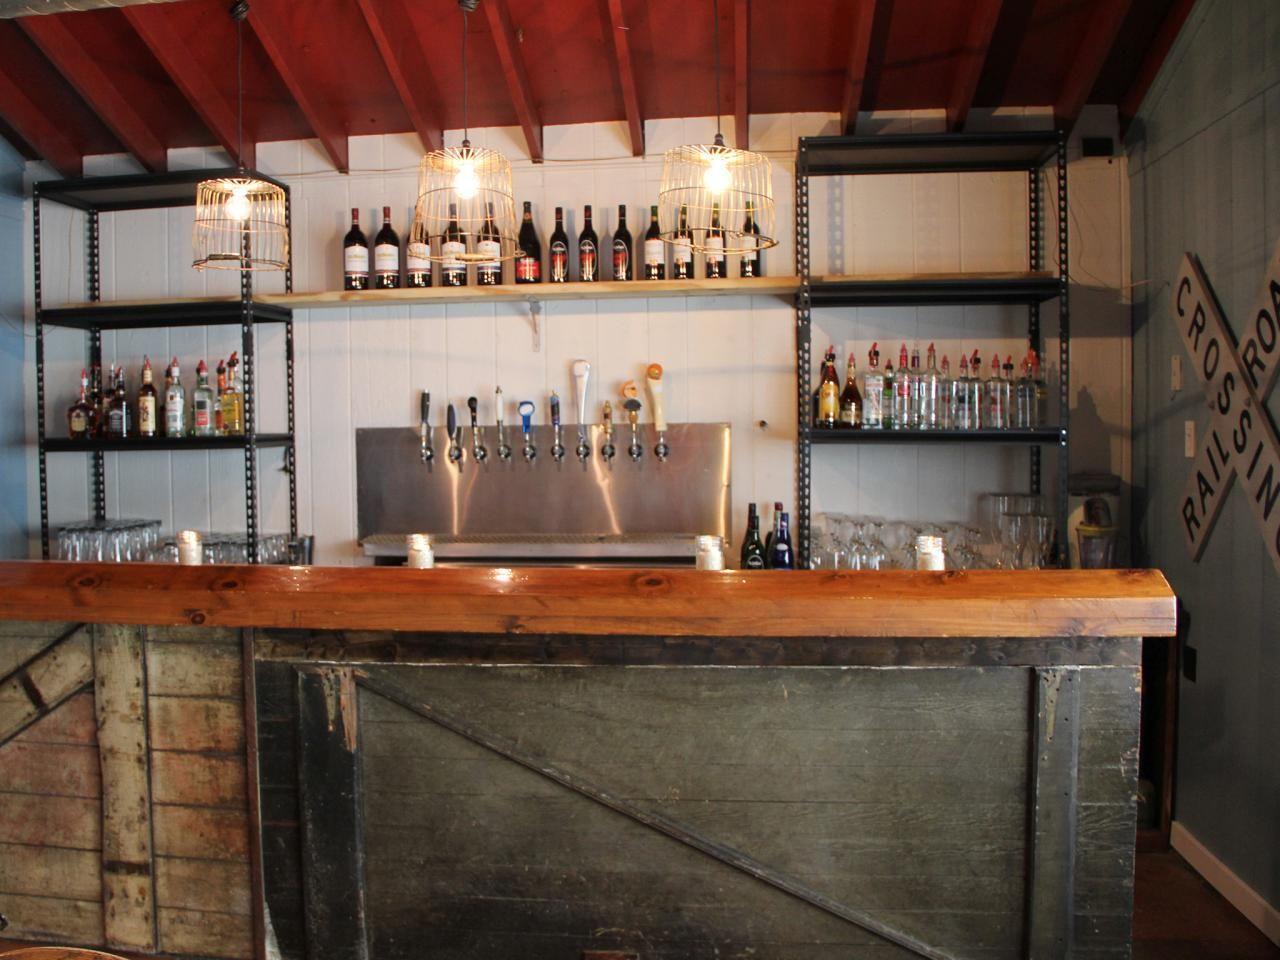 Home Bar Ideas: 89 Design Options | Hgtv, Kitchen design and Bar